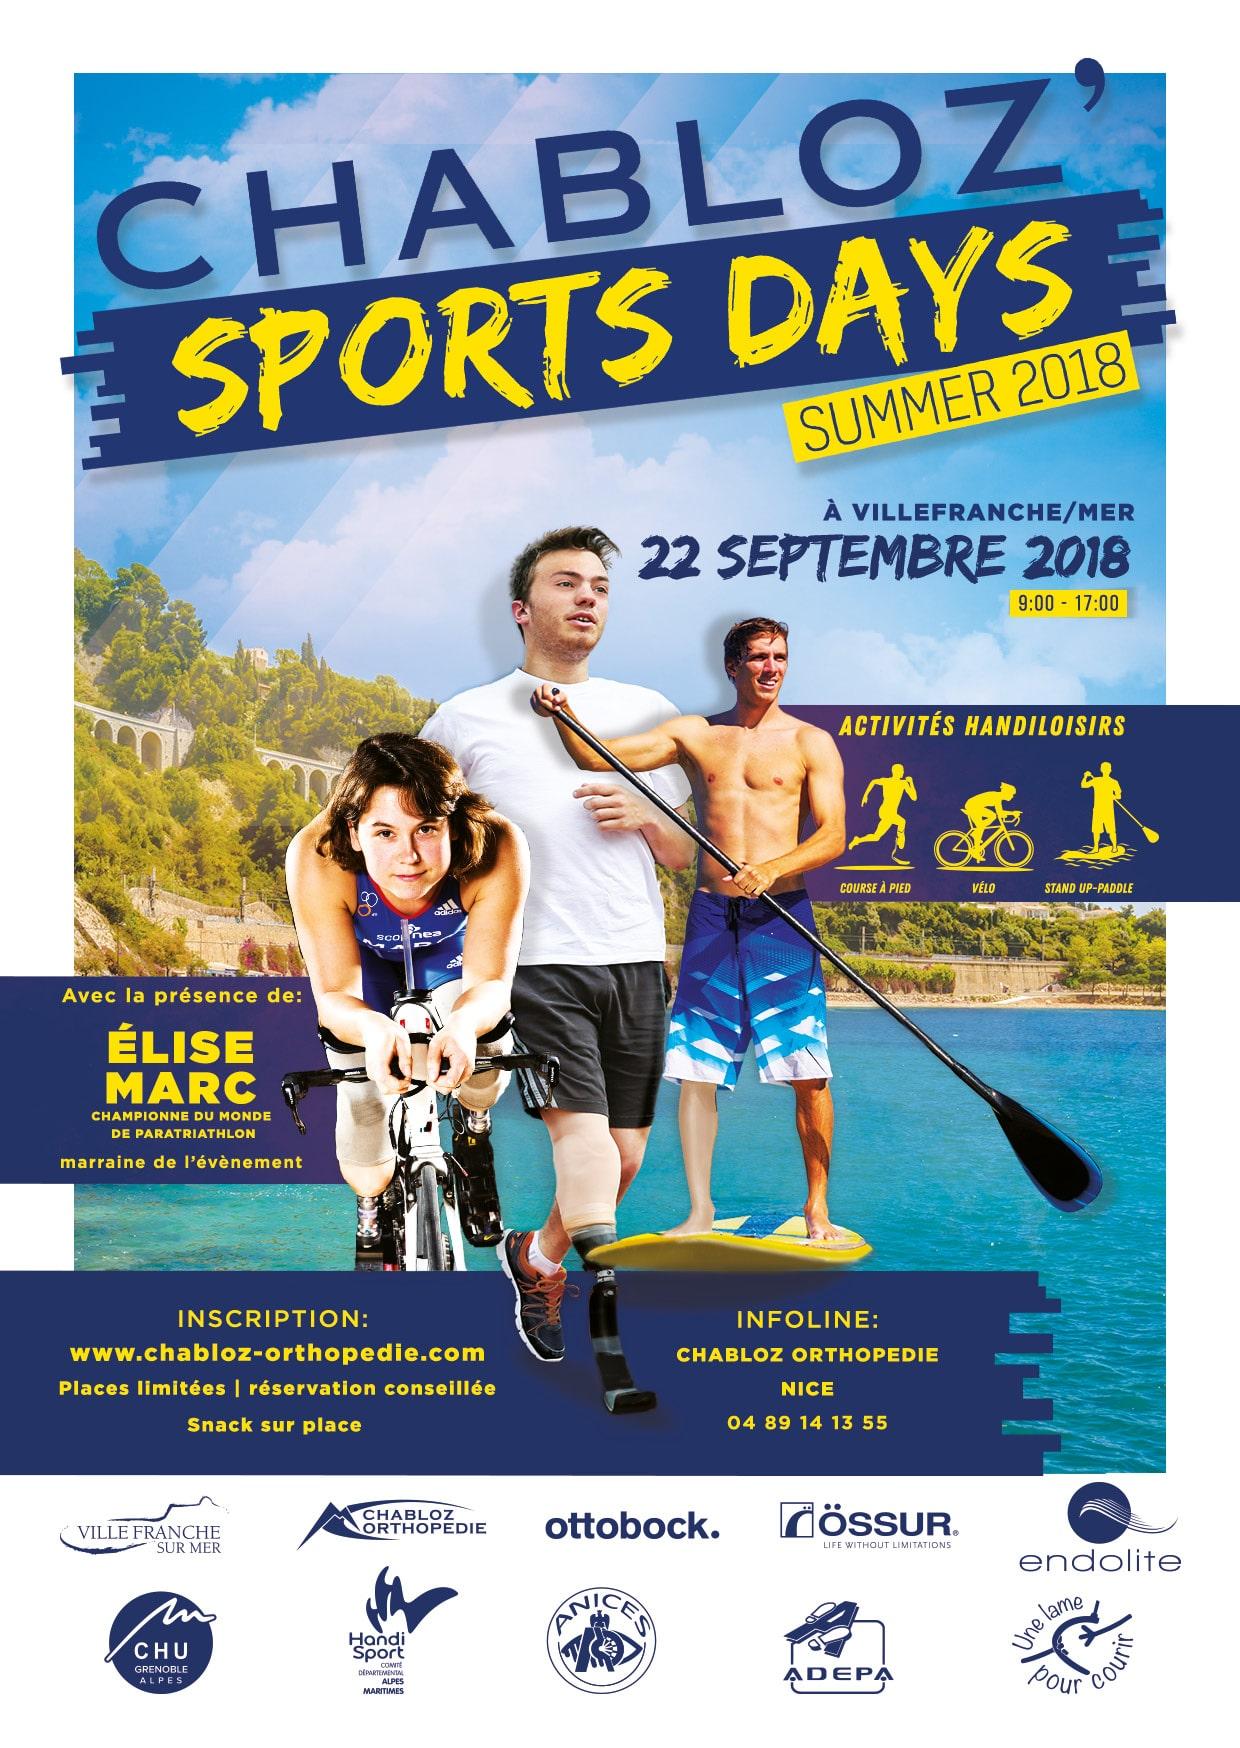 Chabloz -sportdays2018-A6-Multimédia